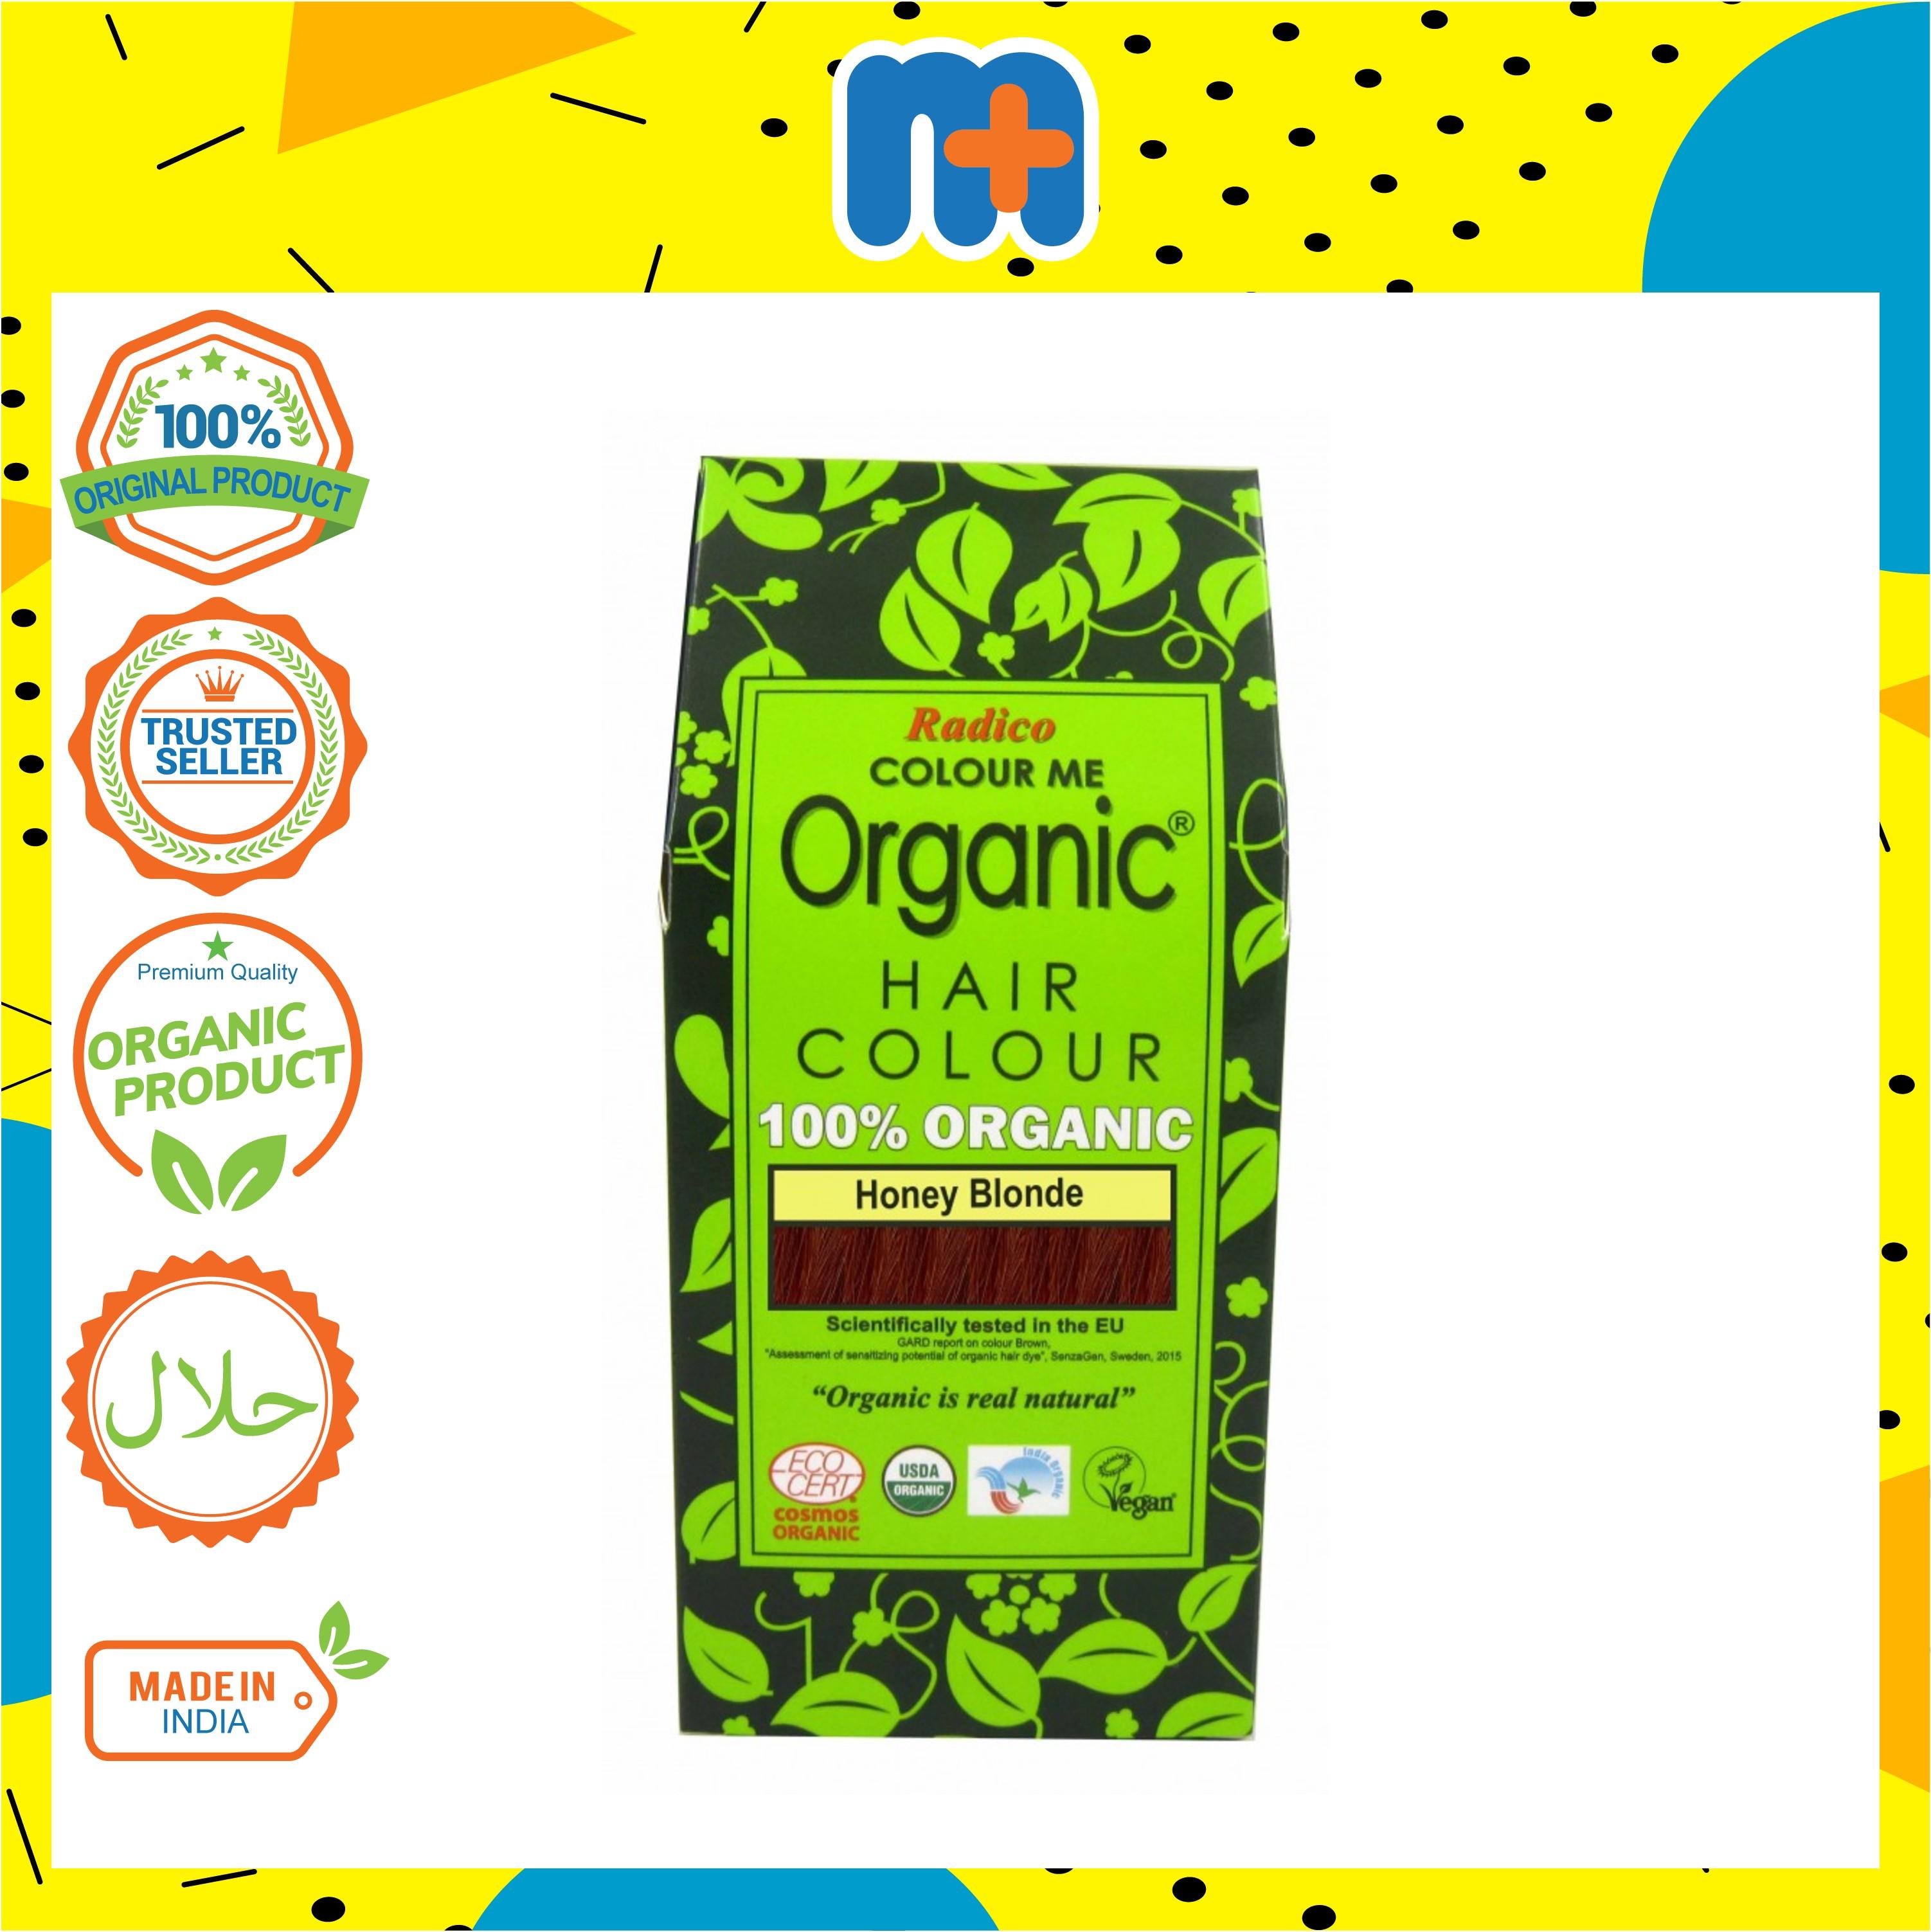 [MPLUS] RADICO 100% Organic Hair Colour Powder 100g (Honey Blonde)